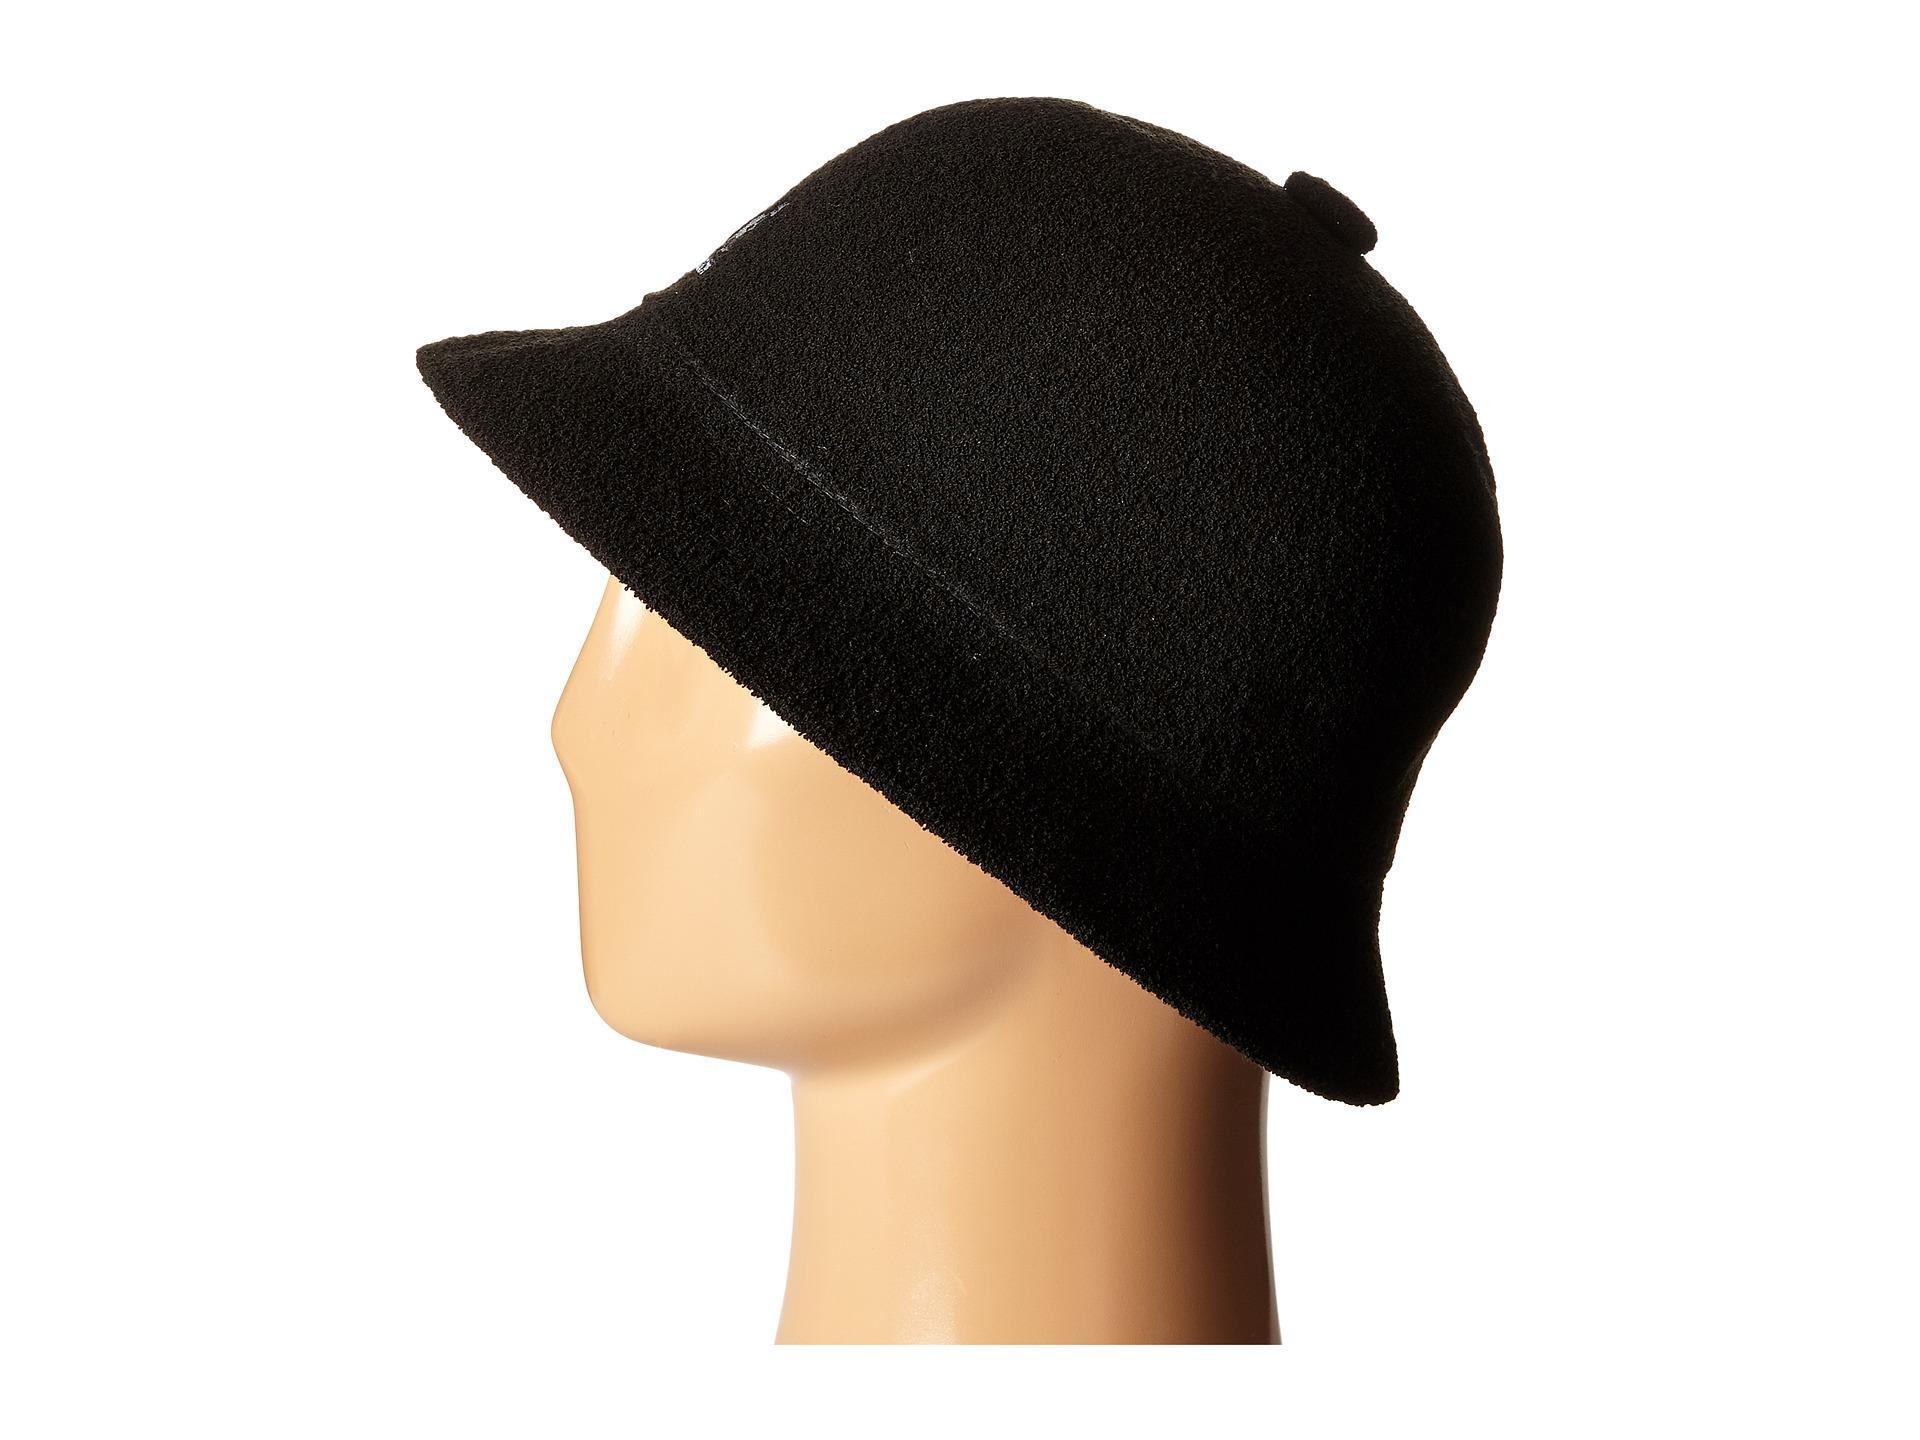 474289f467ce3 Lyst - Kangol Bermuda Casual in Black